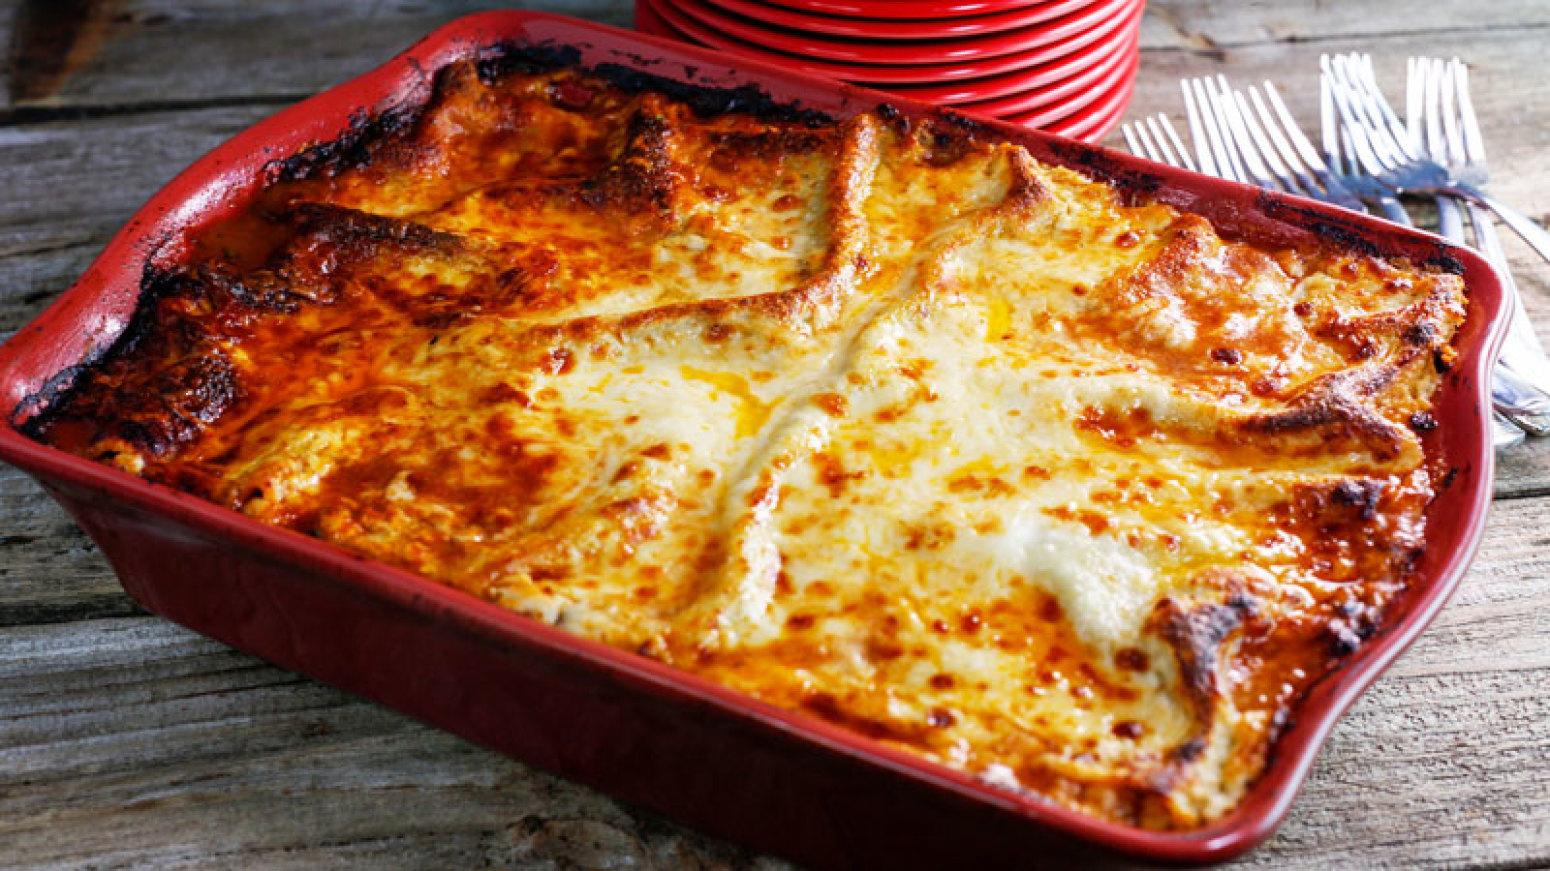 Fabio vivianis lasagna bolognese recipe just a pinch recipes